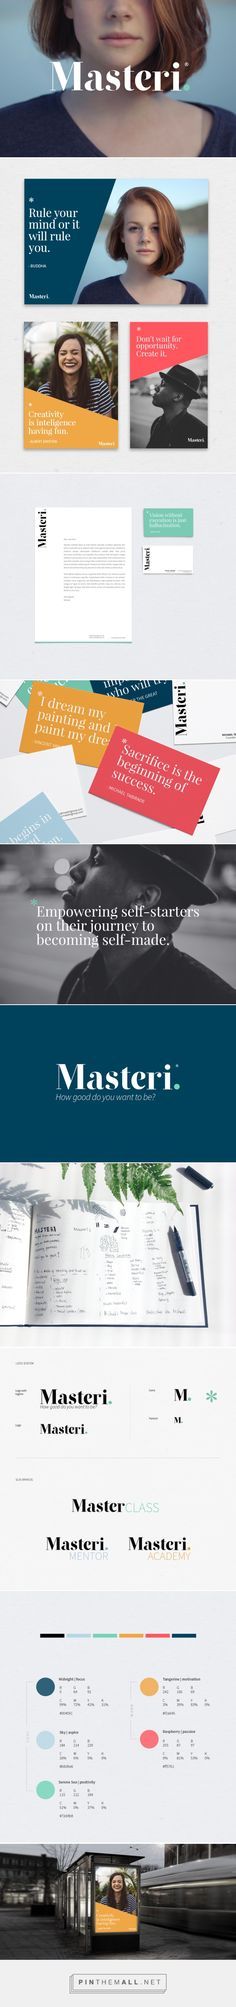 Masteri - branding & brand identity by Marssaié